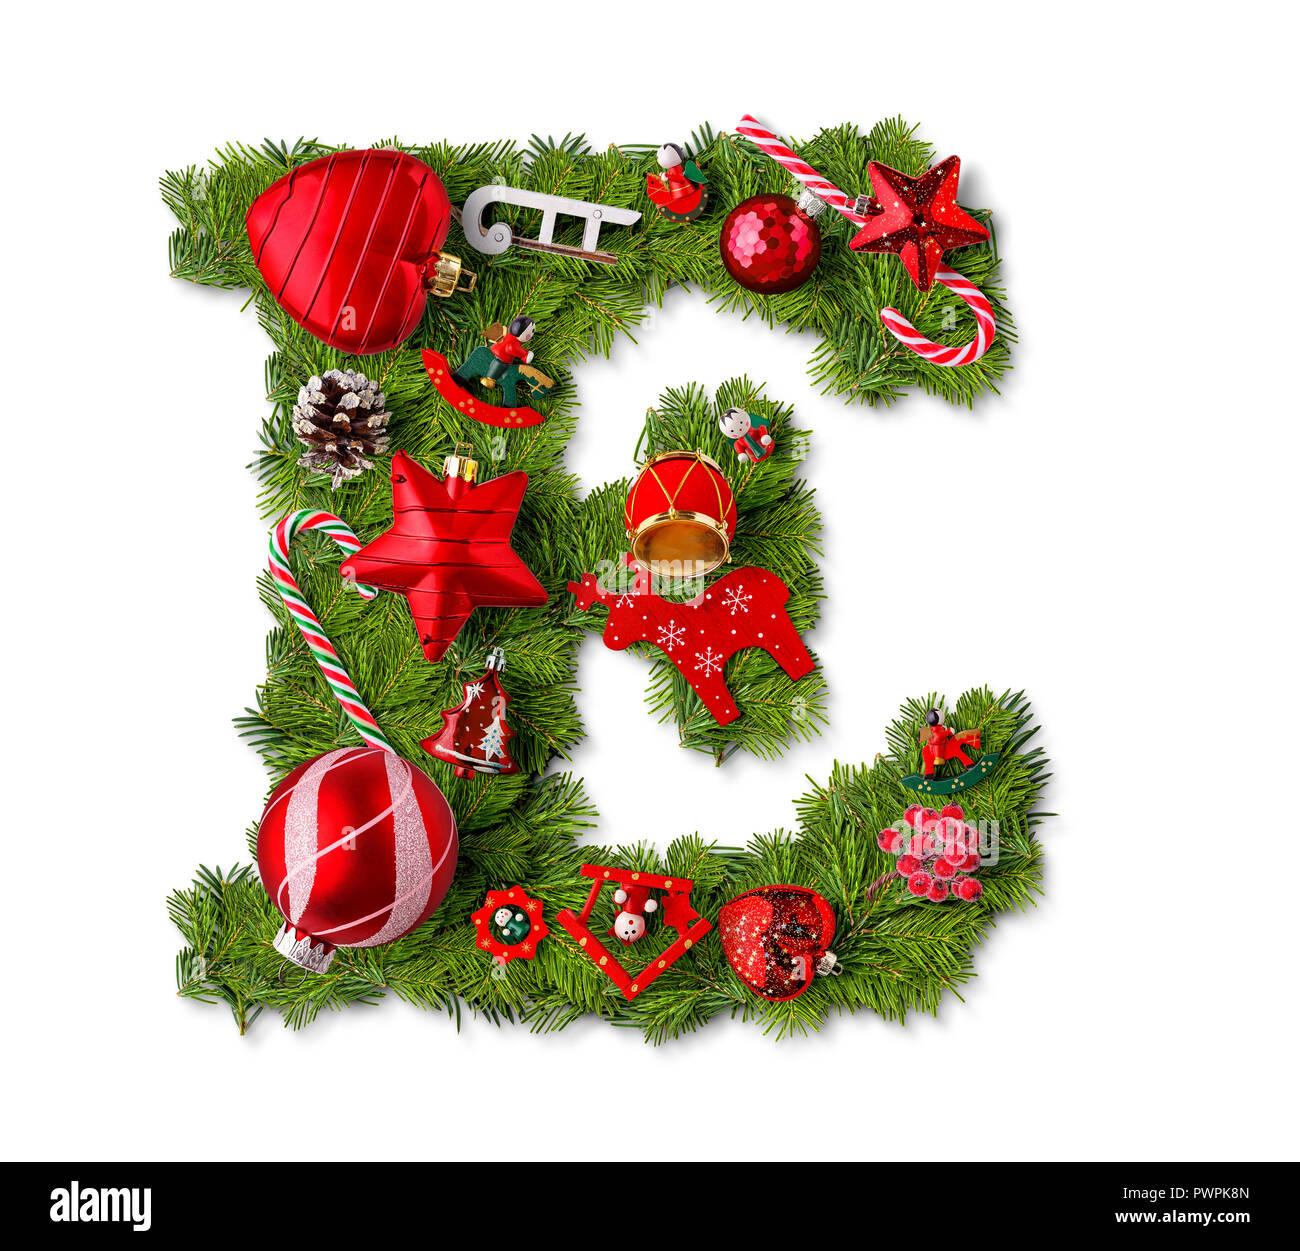 Christmas Alphabet.Christmas Alphabet Letter E Isolated On White Stock Photo